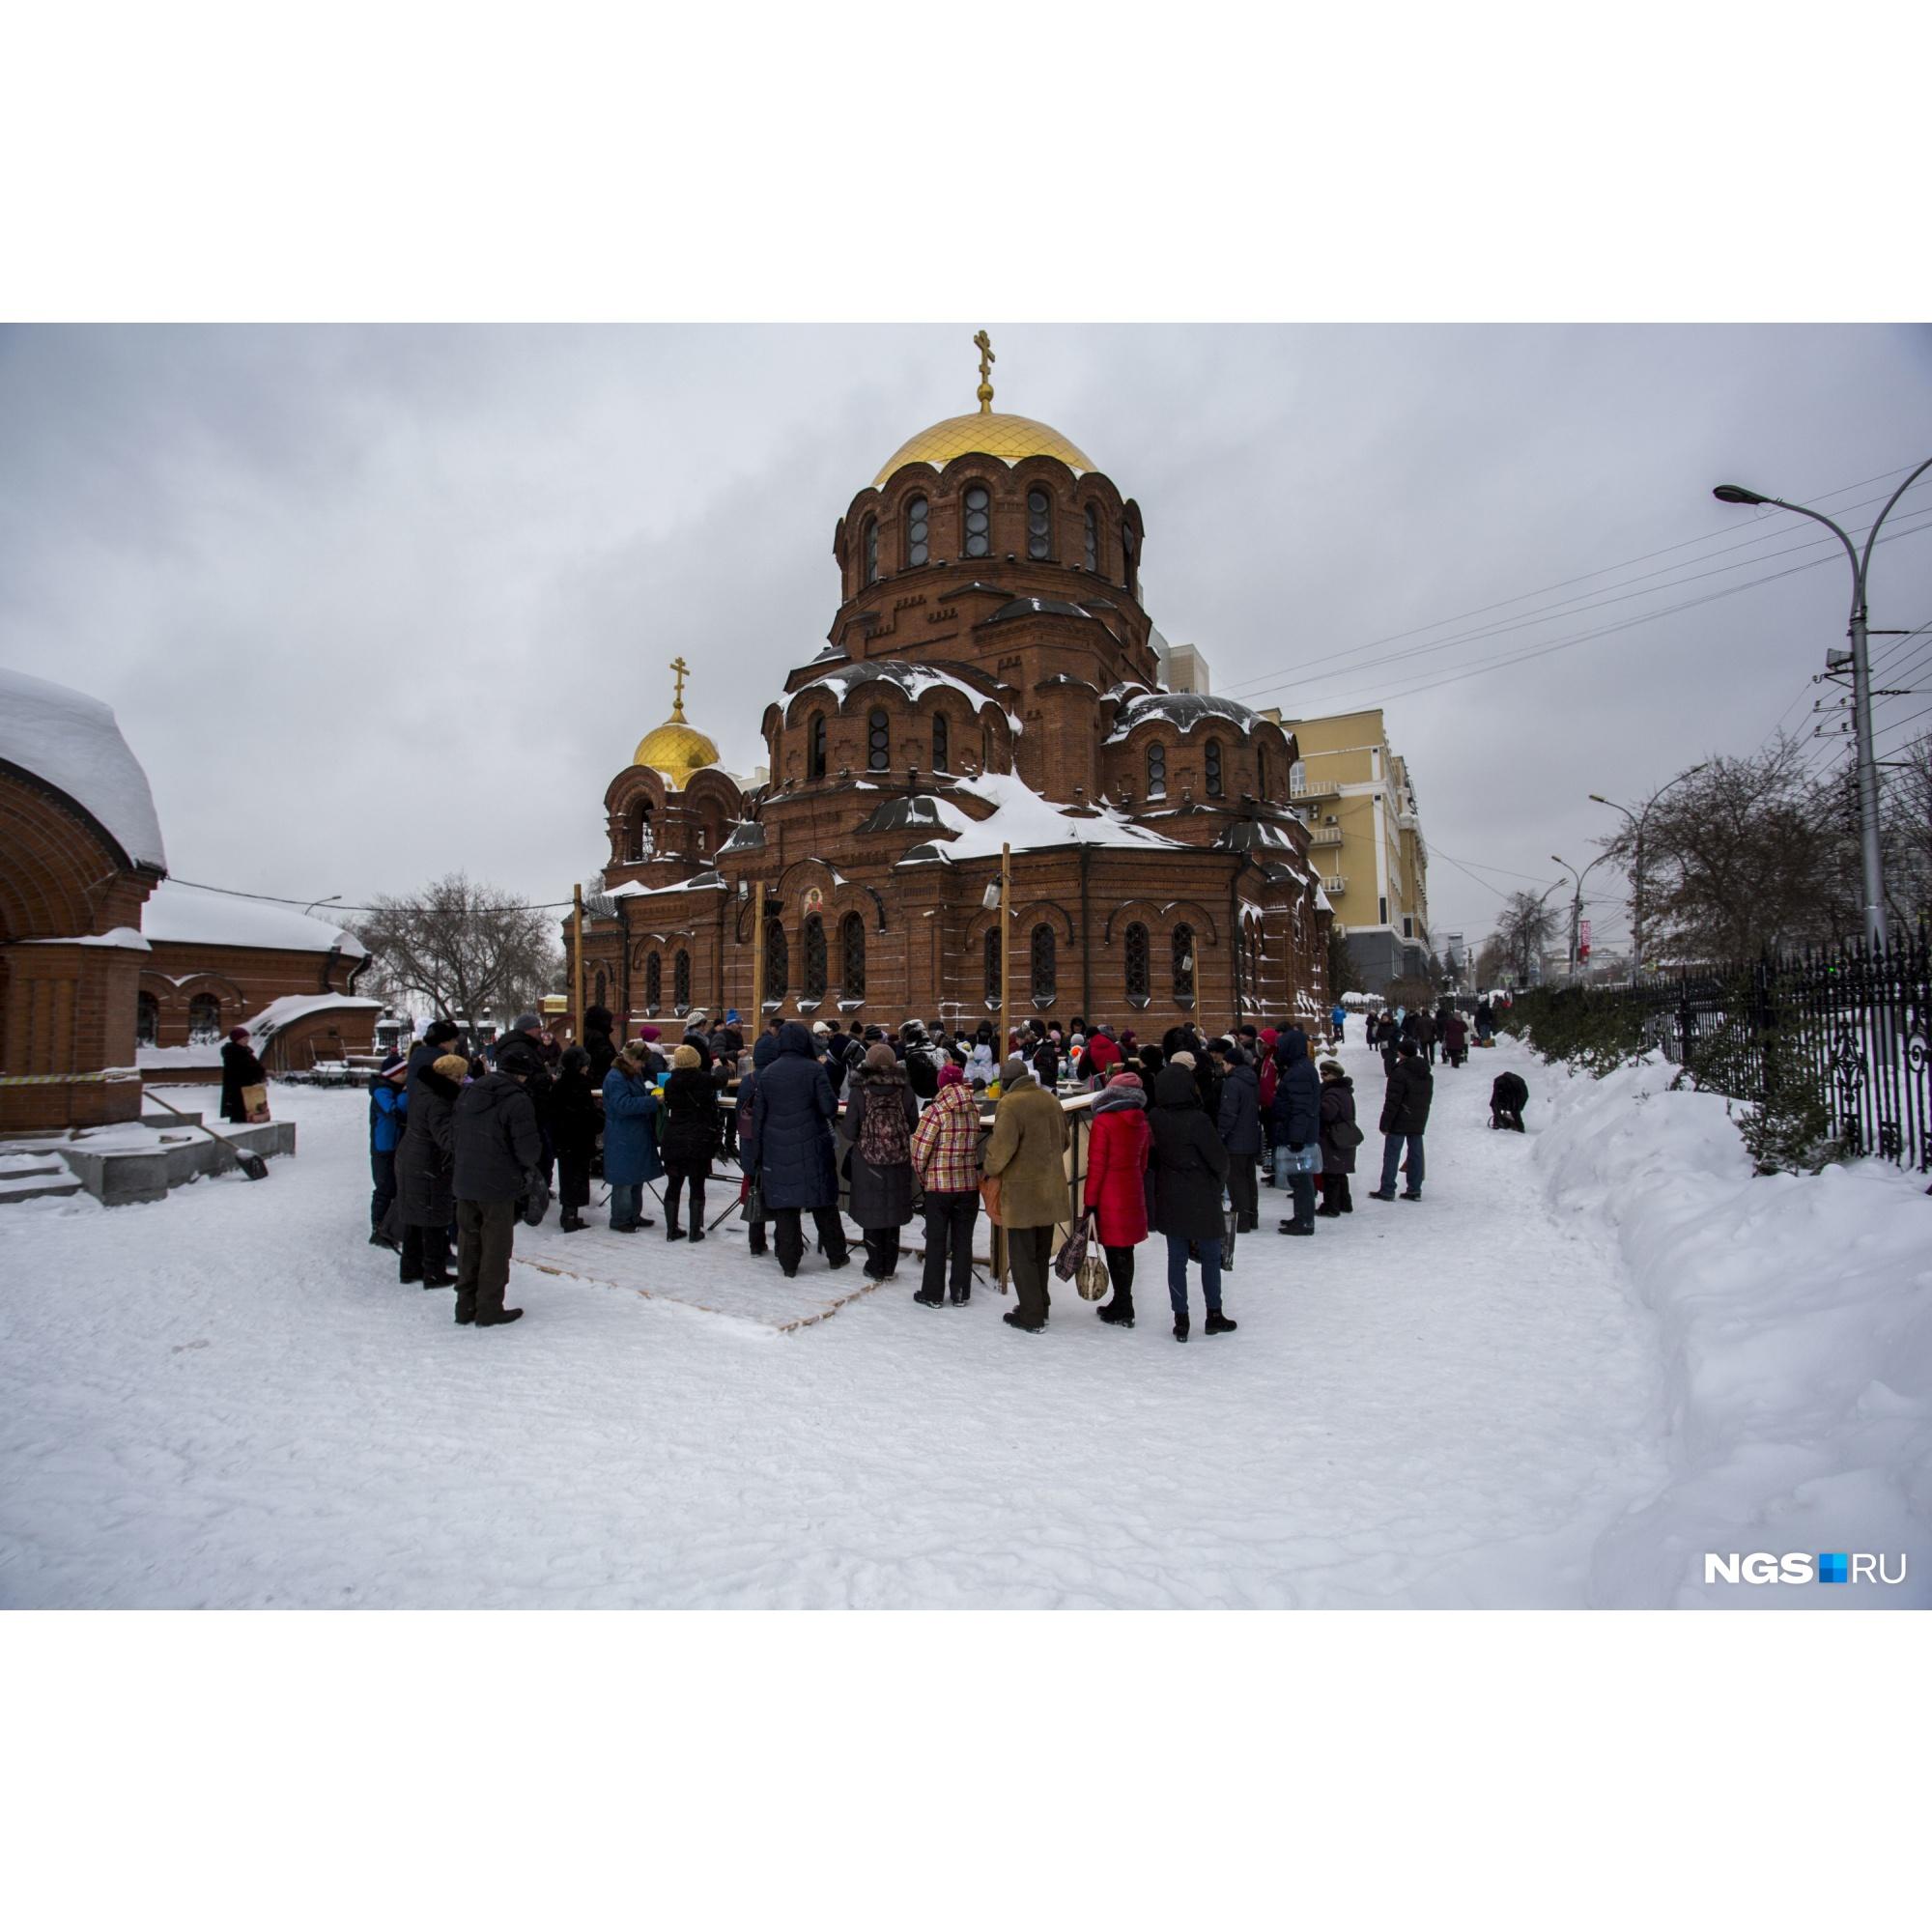 Очередь возле Собора Александра Невского